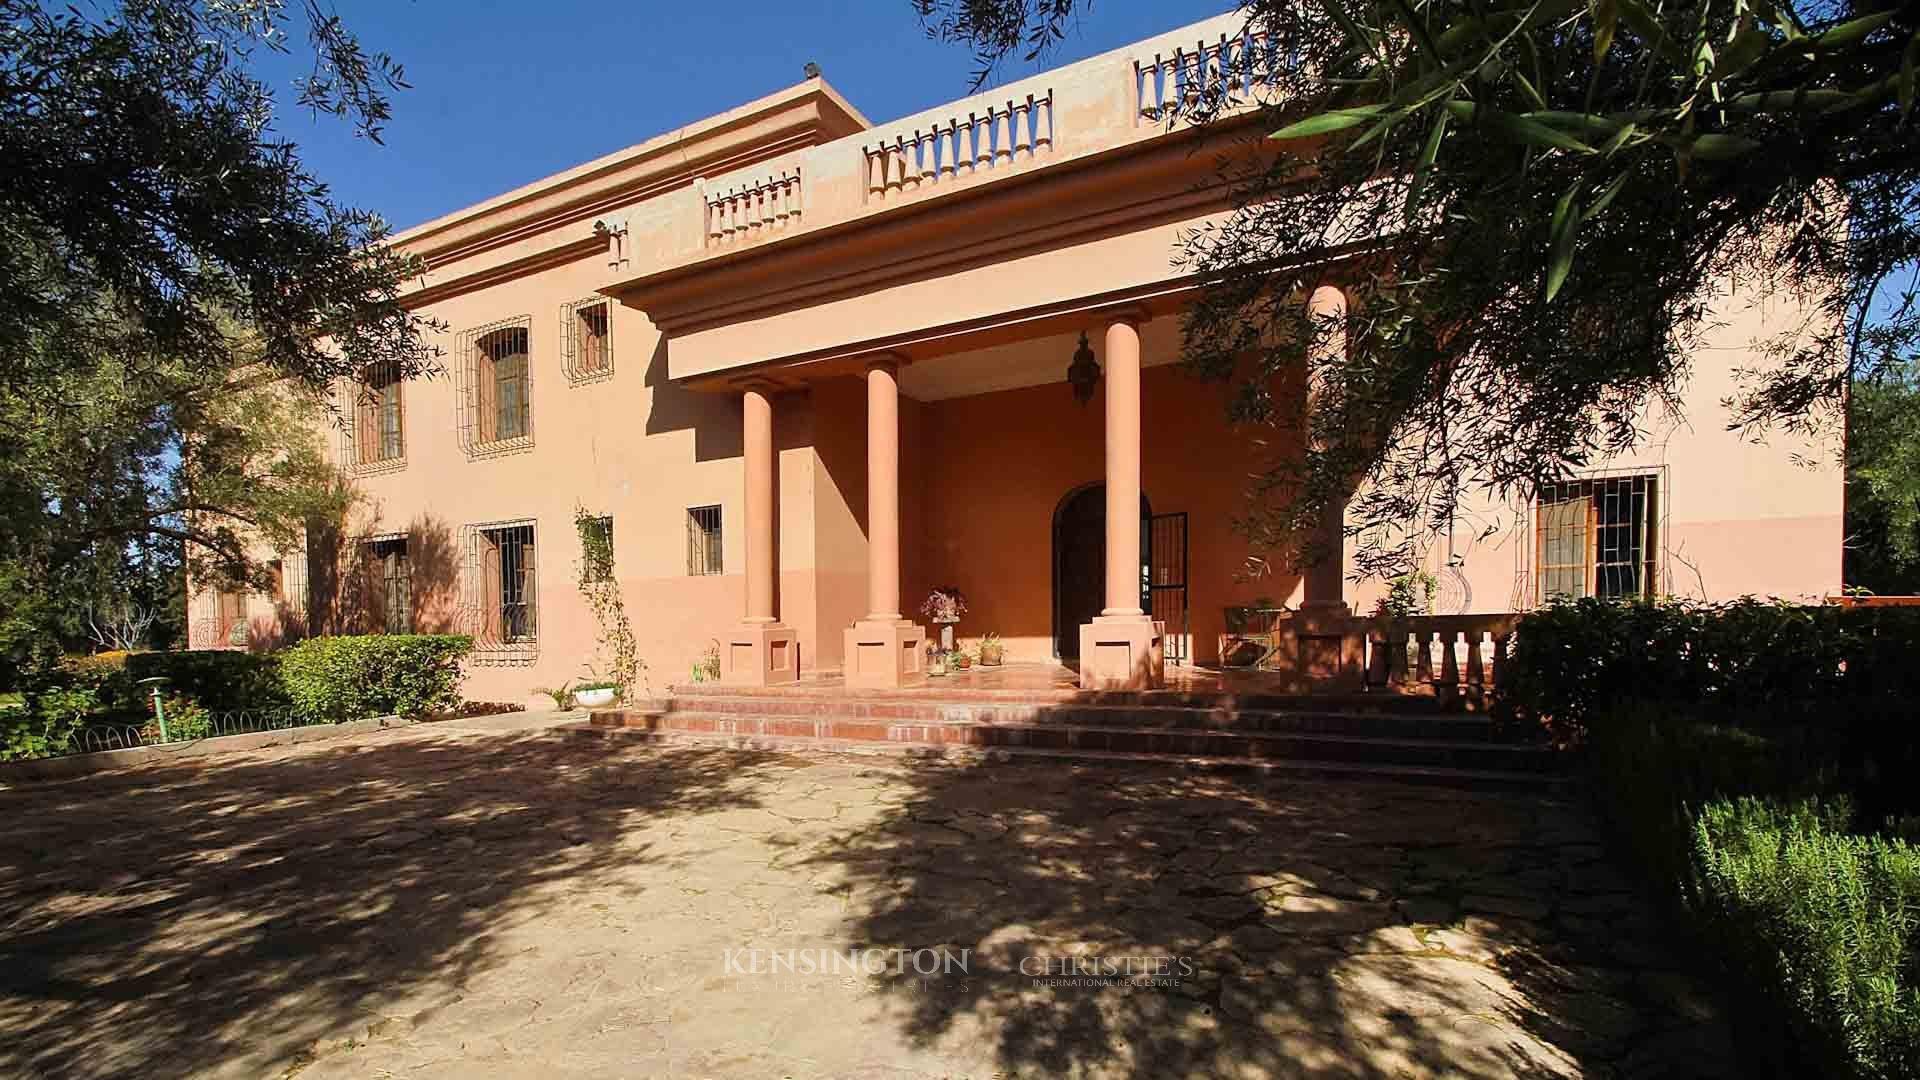 KPPM01171: Villa Jan Luxury Villa Marrakech Morocco